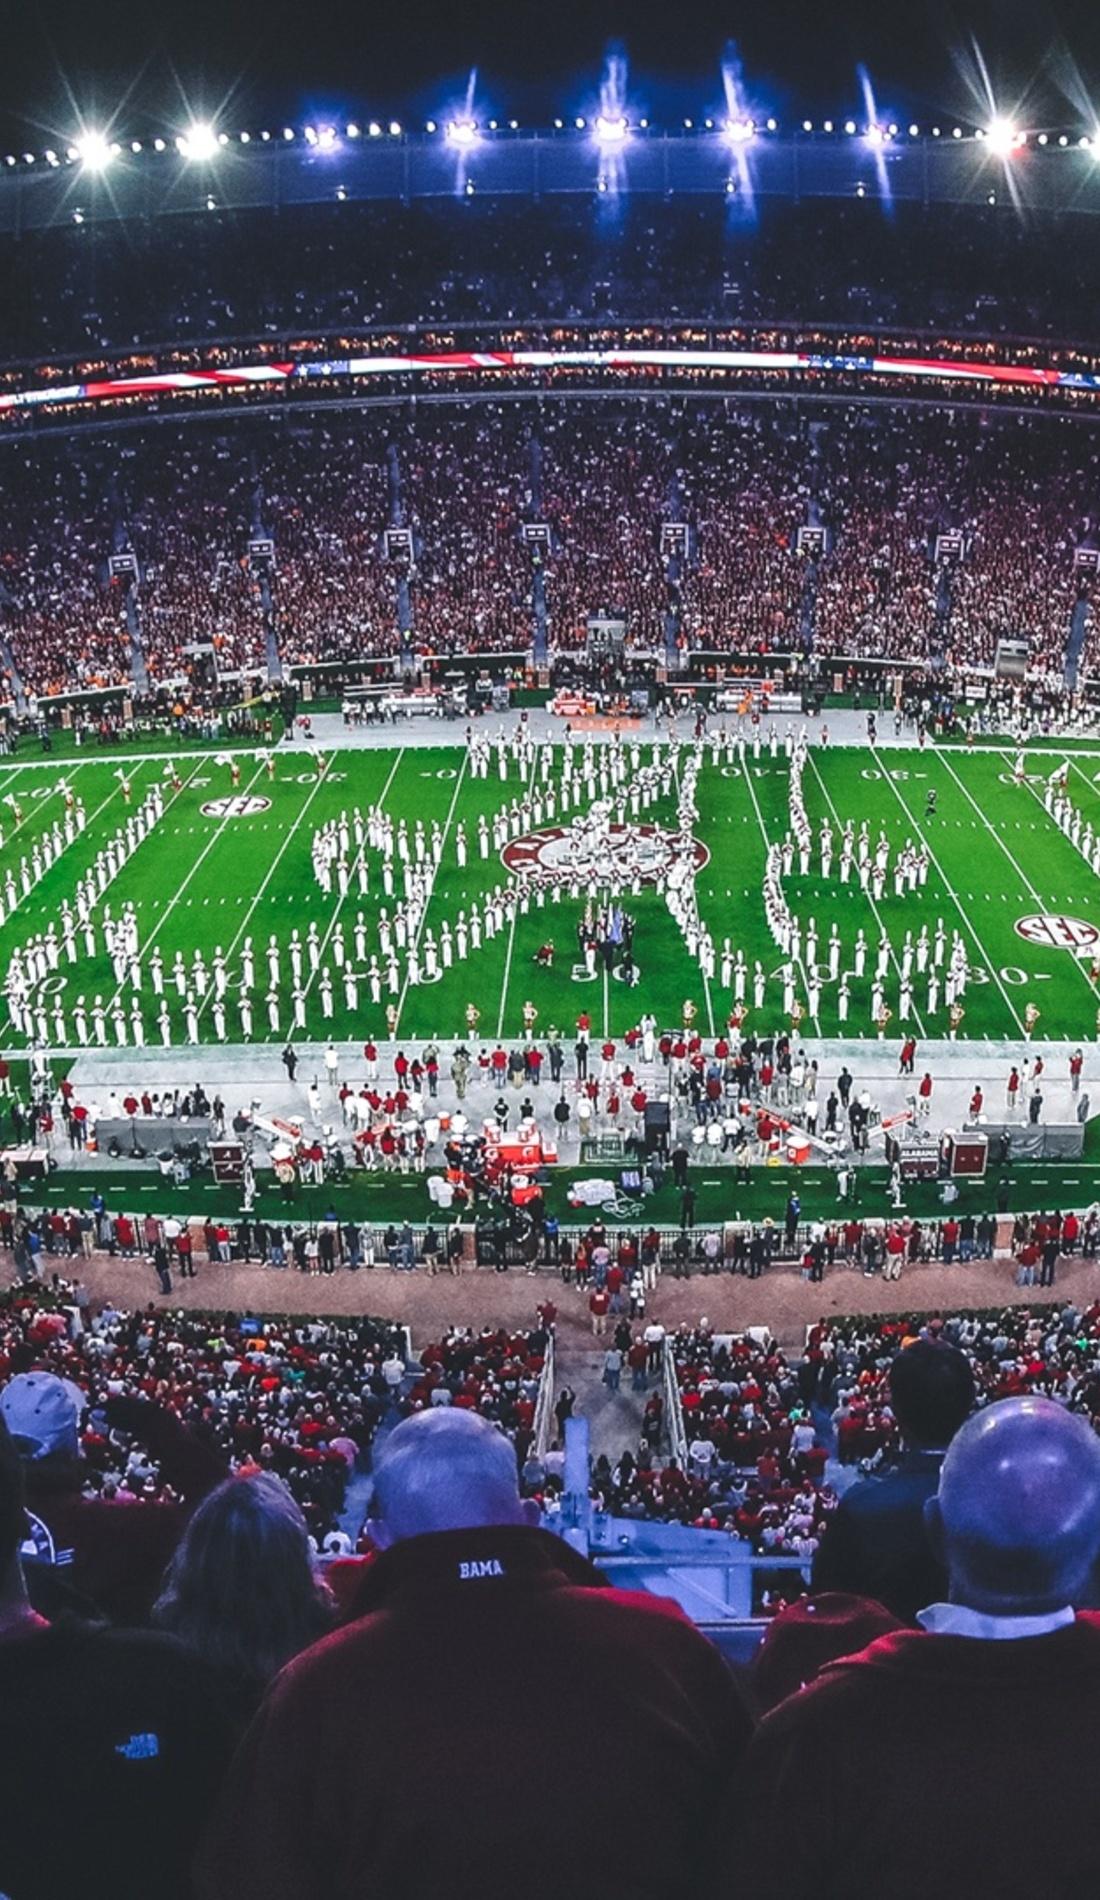 A Alabama Crimson Tide Football live event